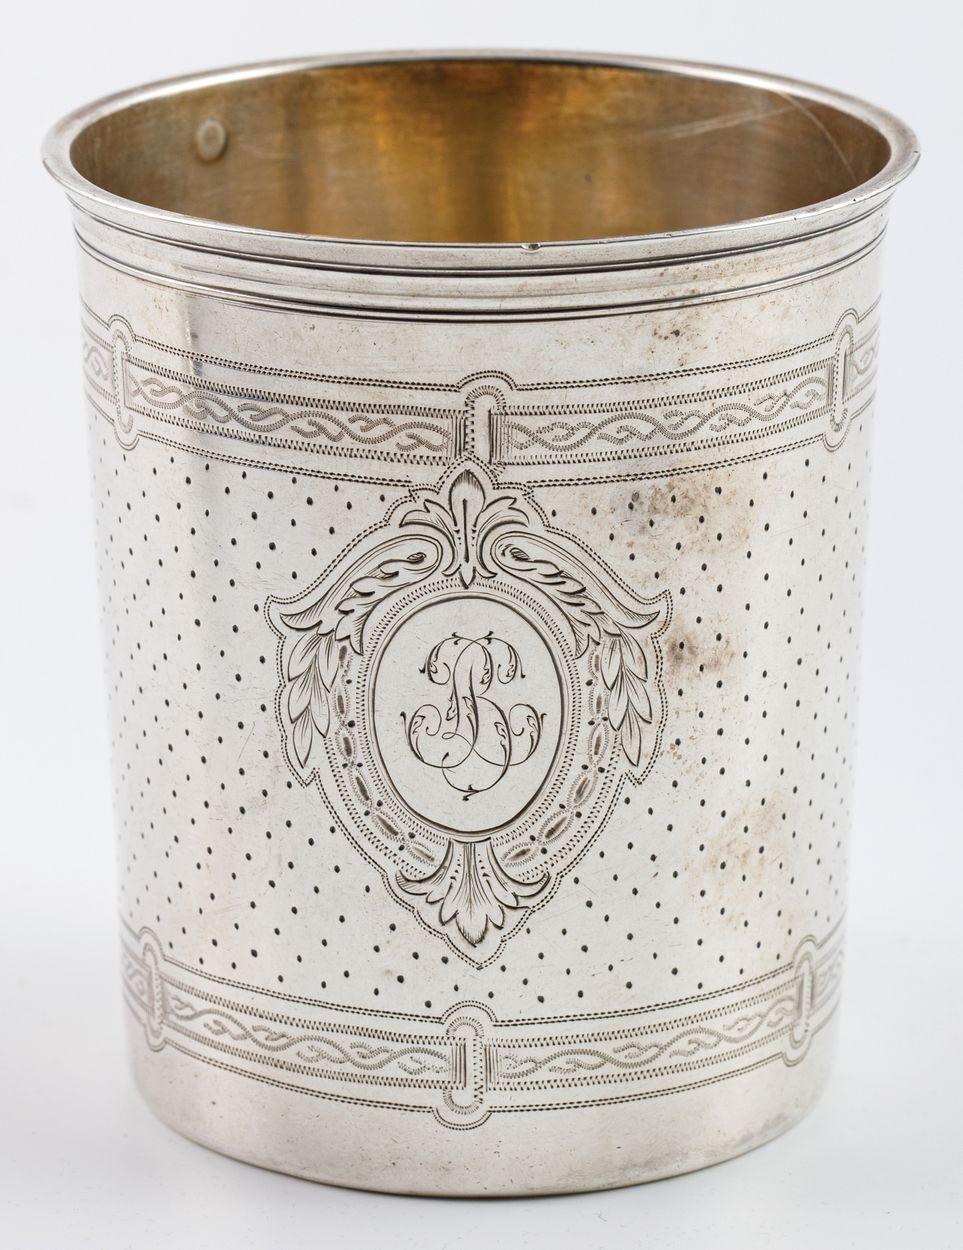 KUBEK, Francja, Paryż, Marie-Françoise Lefèvre ok. 1809